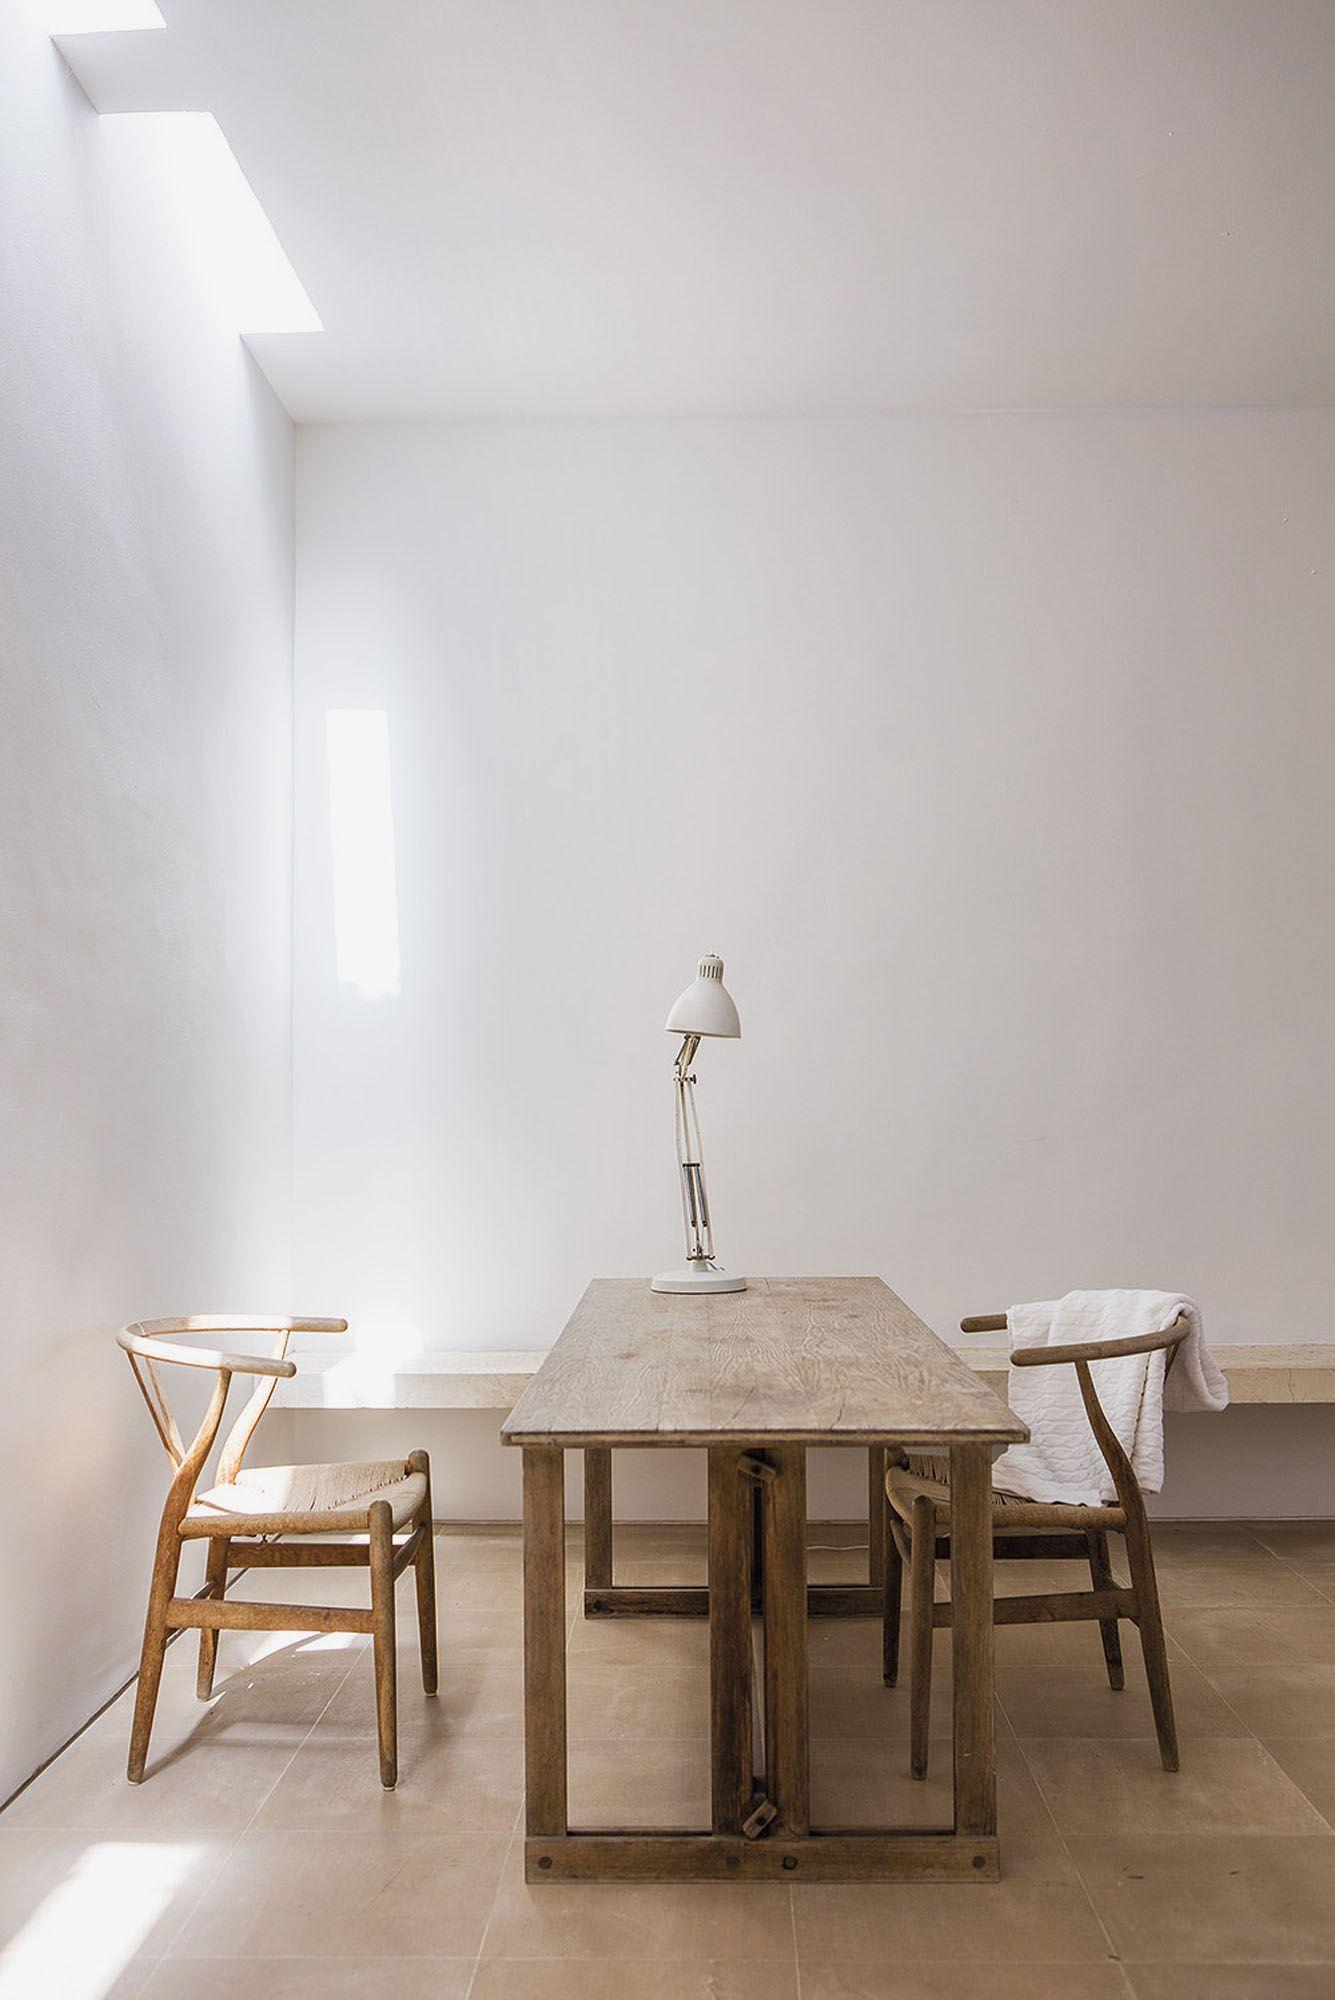 Neuendorf House by John Pawson and Claudio Silvestrin